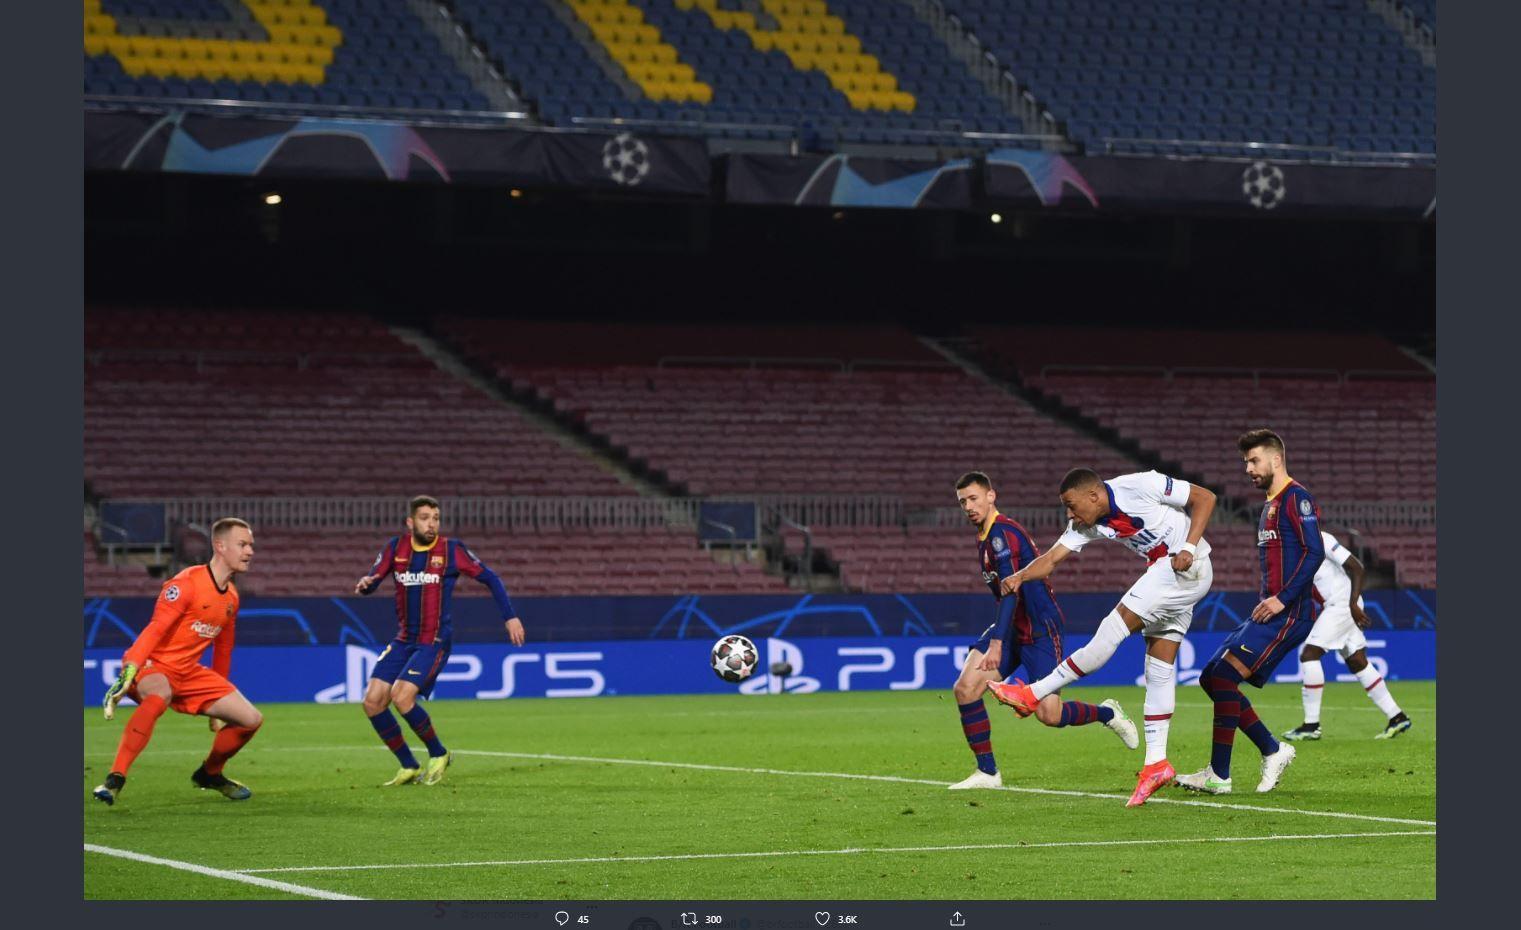 Penyerang PSG, Kylian Mbappe mencetak gol ke gawang Barcelona di Liga Champions, Rabu (17/2/2021)  dini hari WIB.